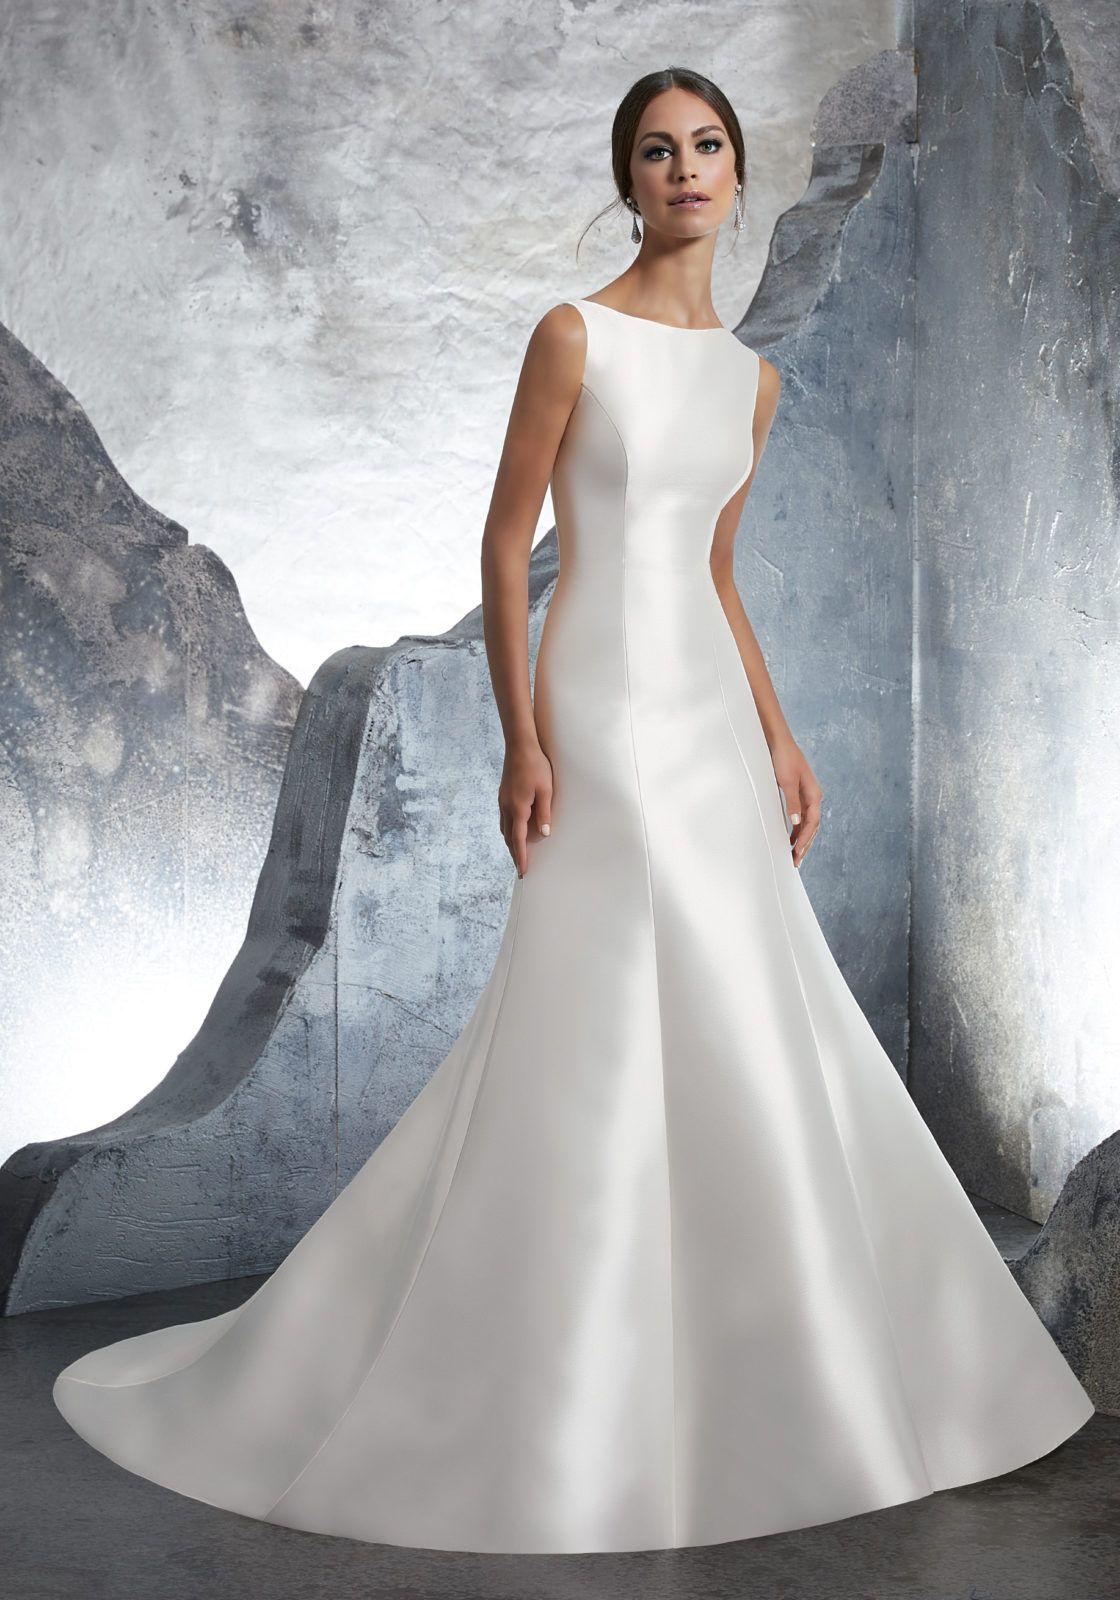 Kassandra Wedding Dress Morilee Plain Wedding Dress Wedding Dresses Satin Wedding Dress Styles